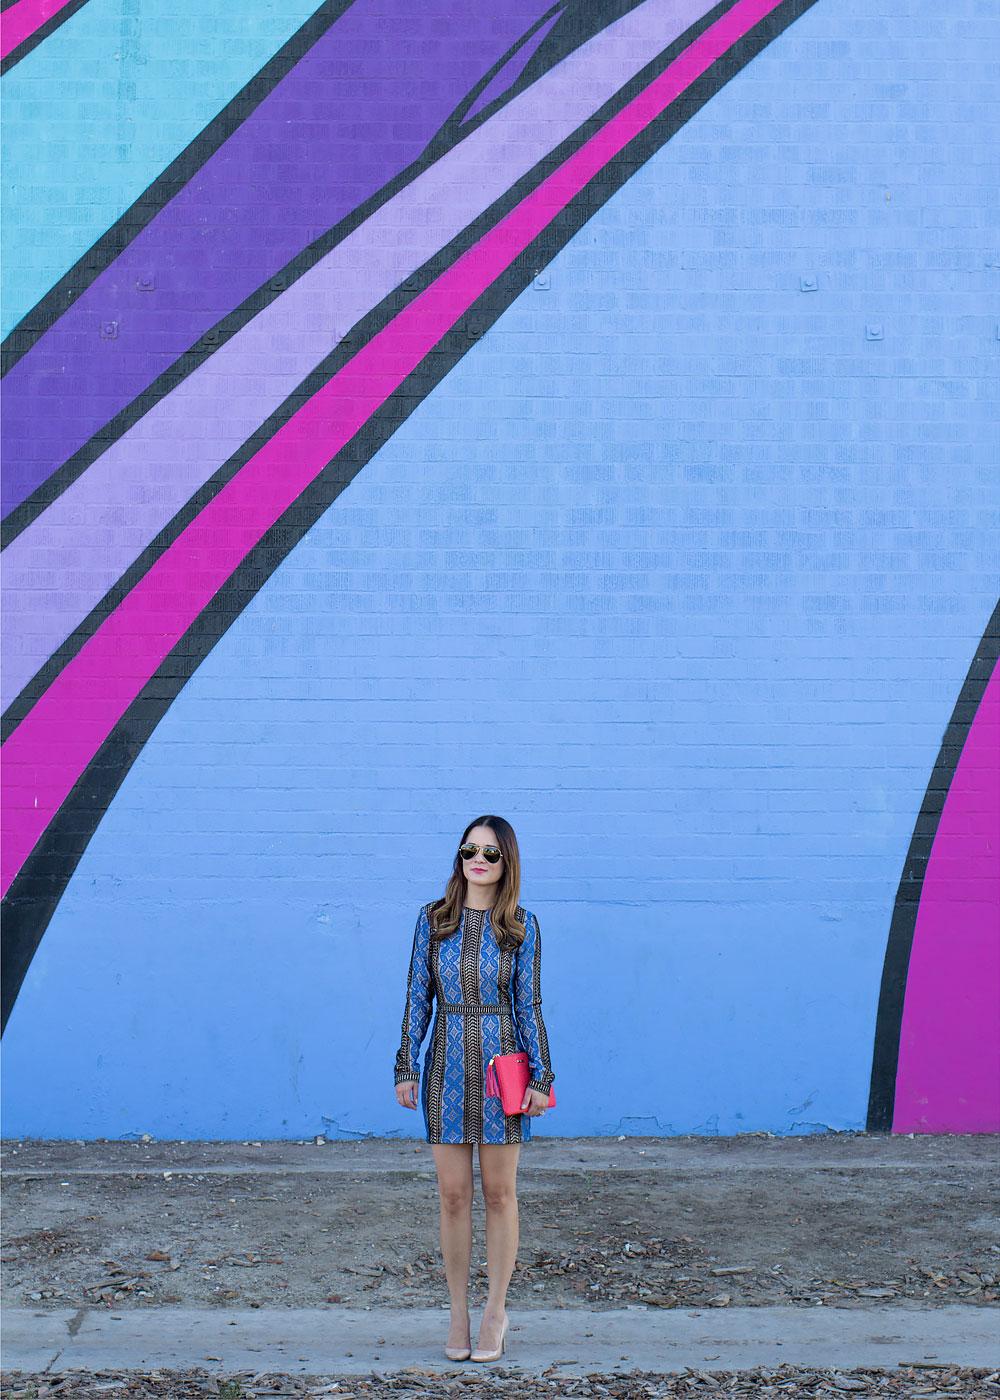 North Hollywood Colorful Mural Wall